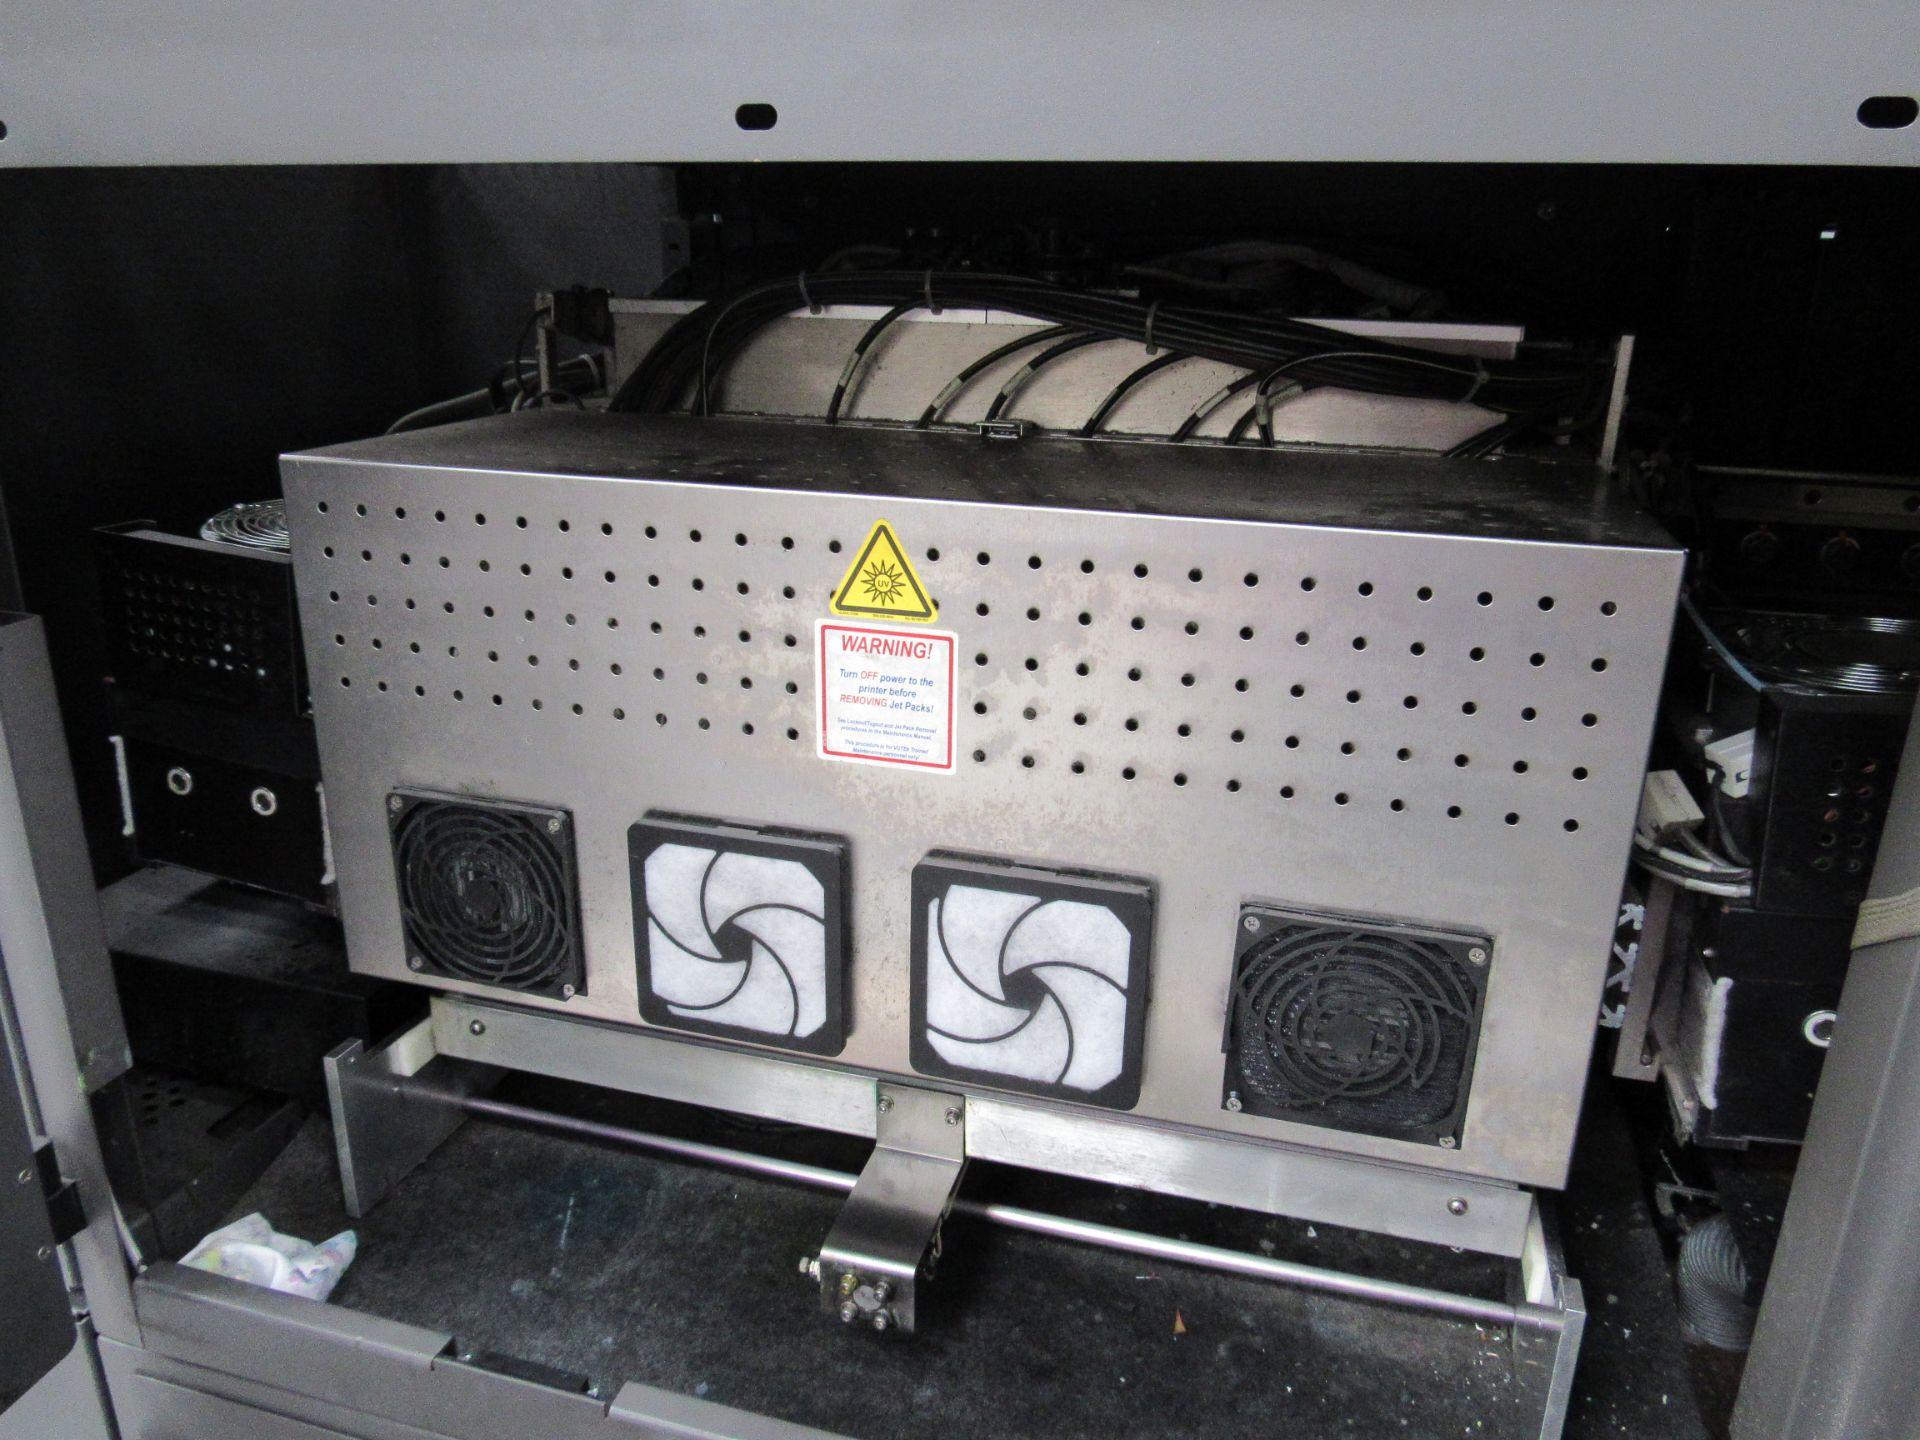 EFI VUTEk H2000 Pro - UltraDrop Technology UV 2m Hybrid Printer, Serial Number 262013, Dec 2014, - Image 10 of 16